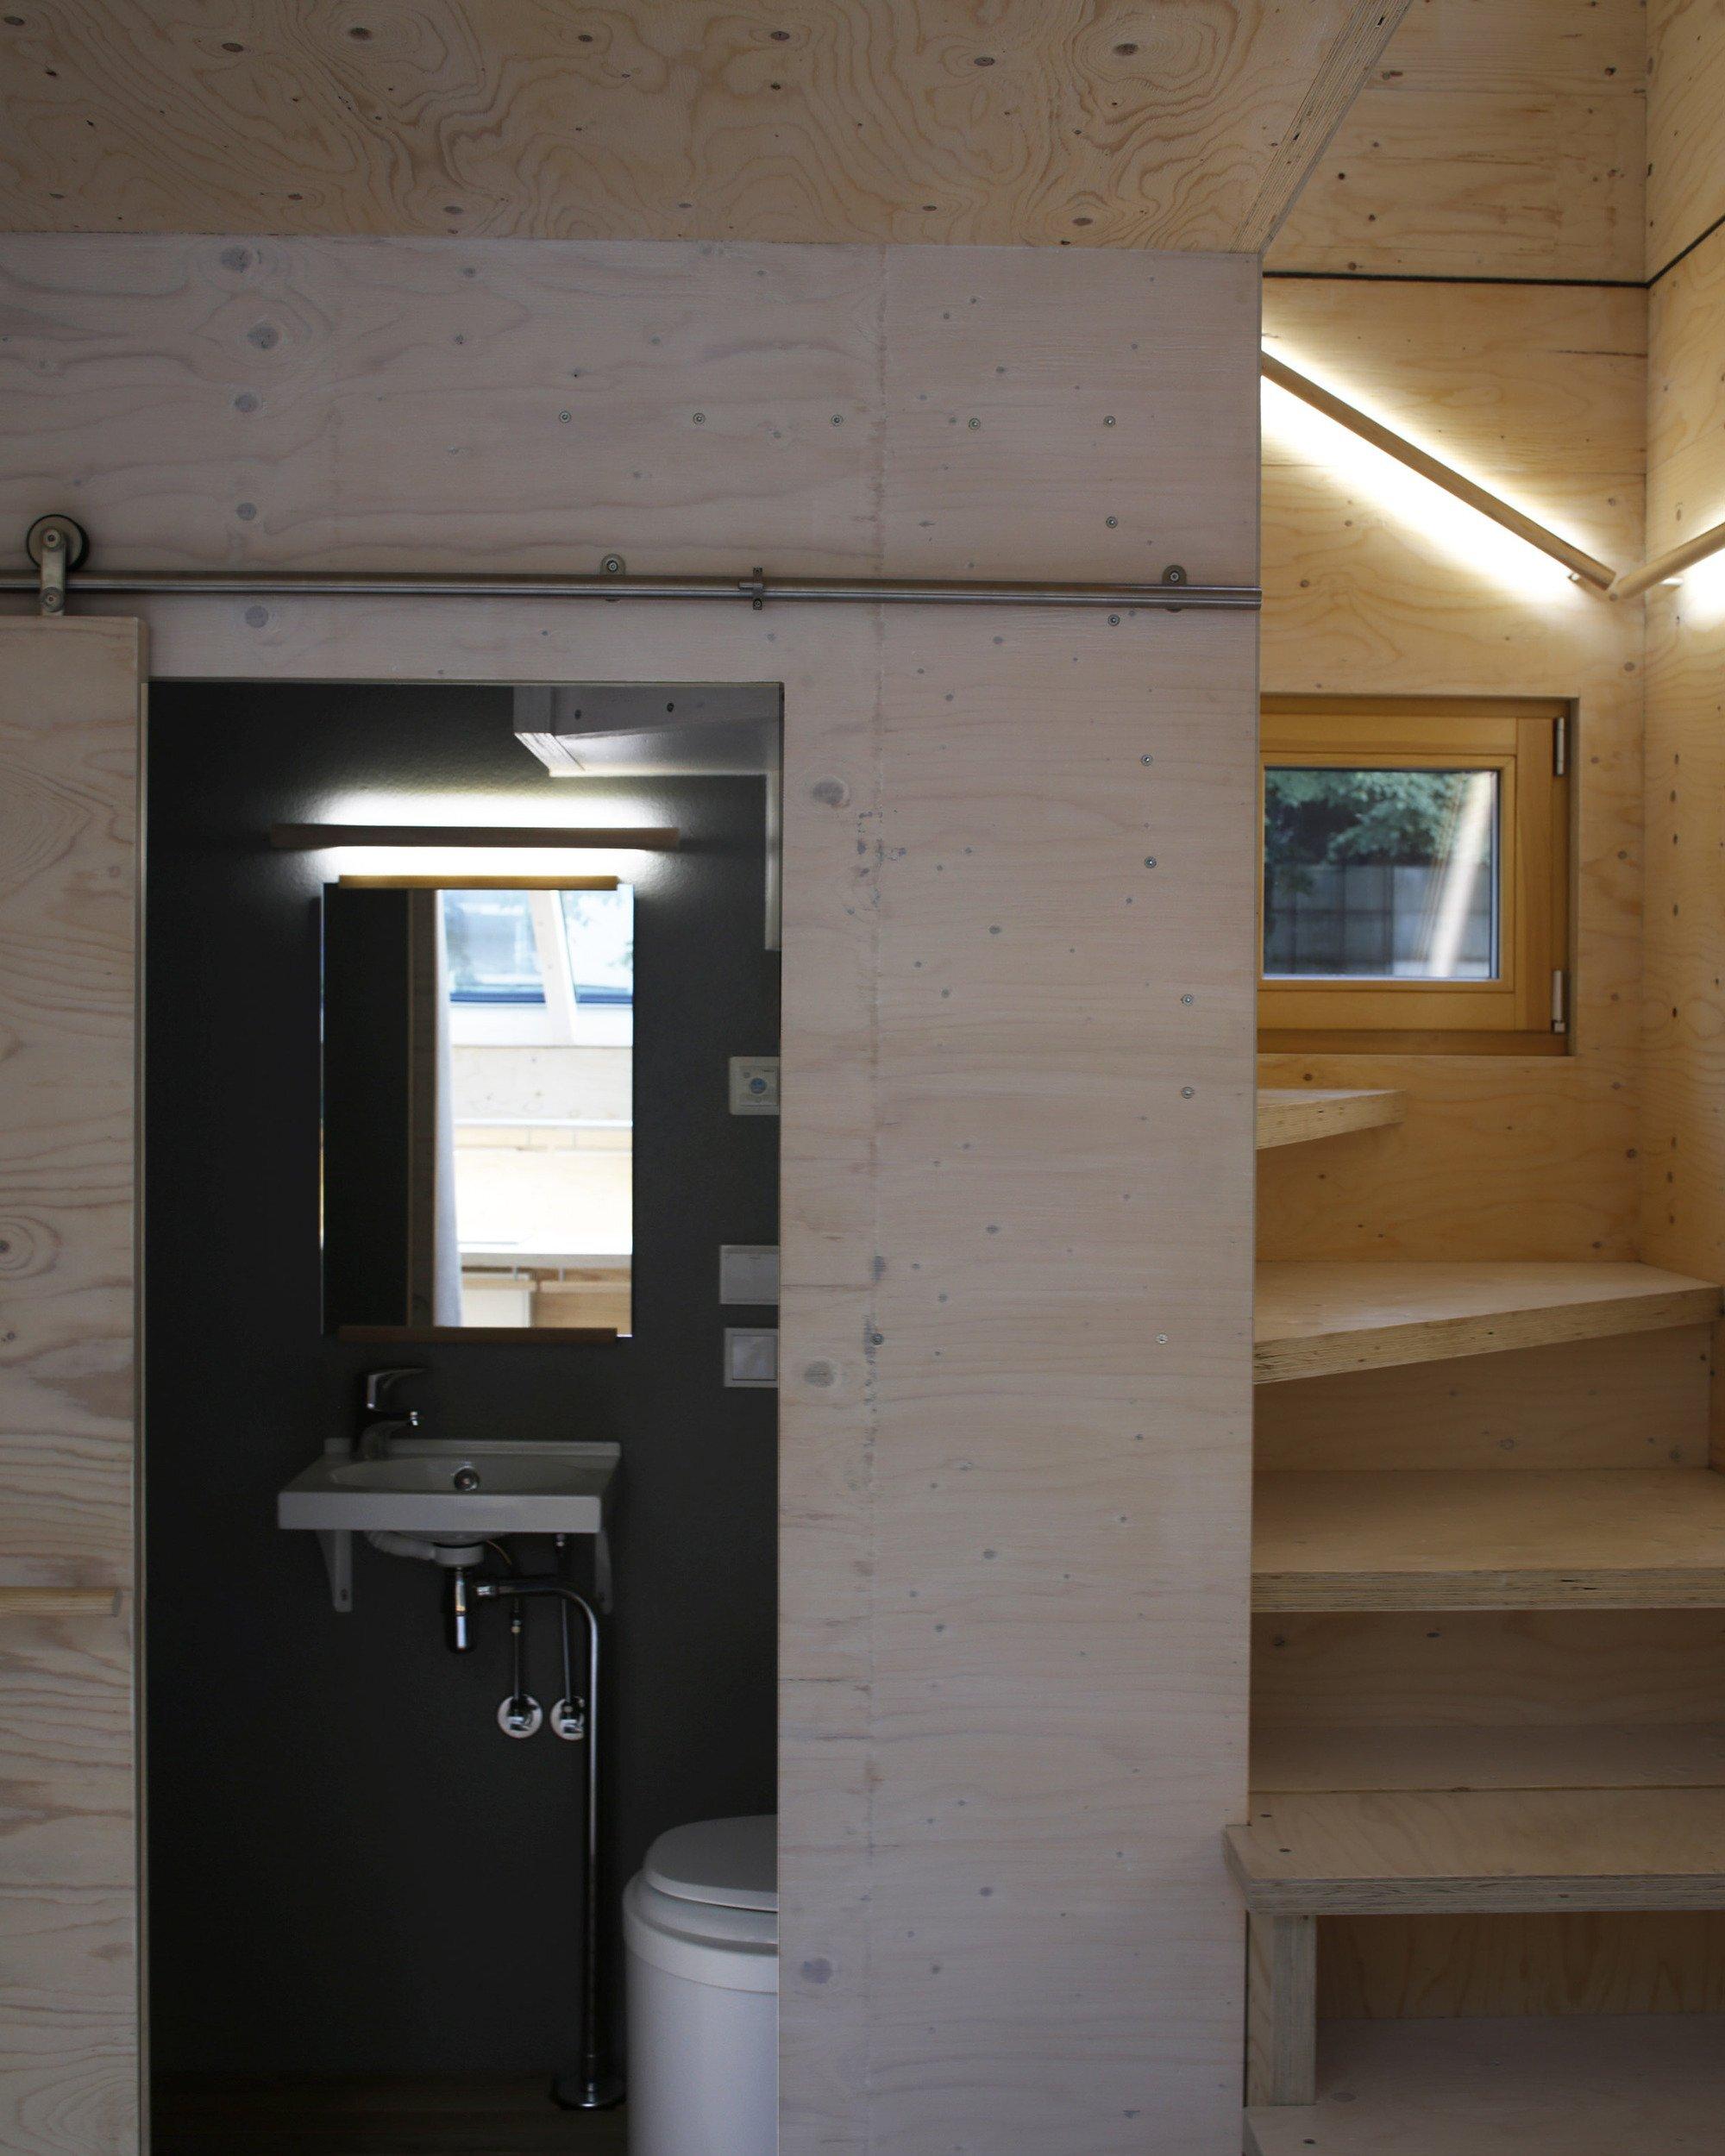 Kokoon - Aalto University Wood Program - Finland - Bathroom - Humble Homes